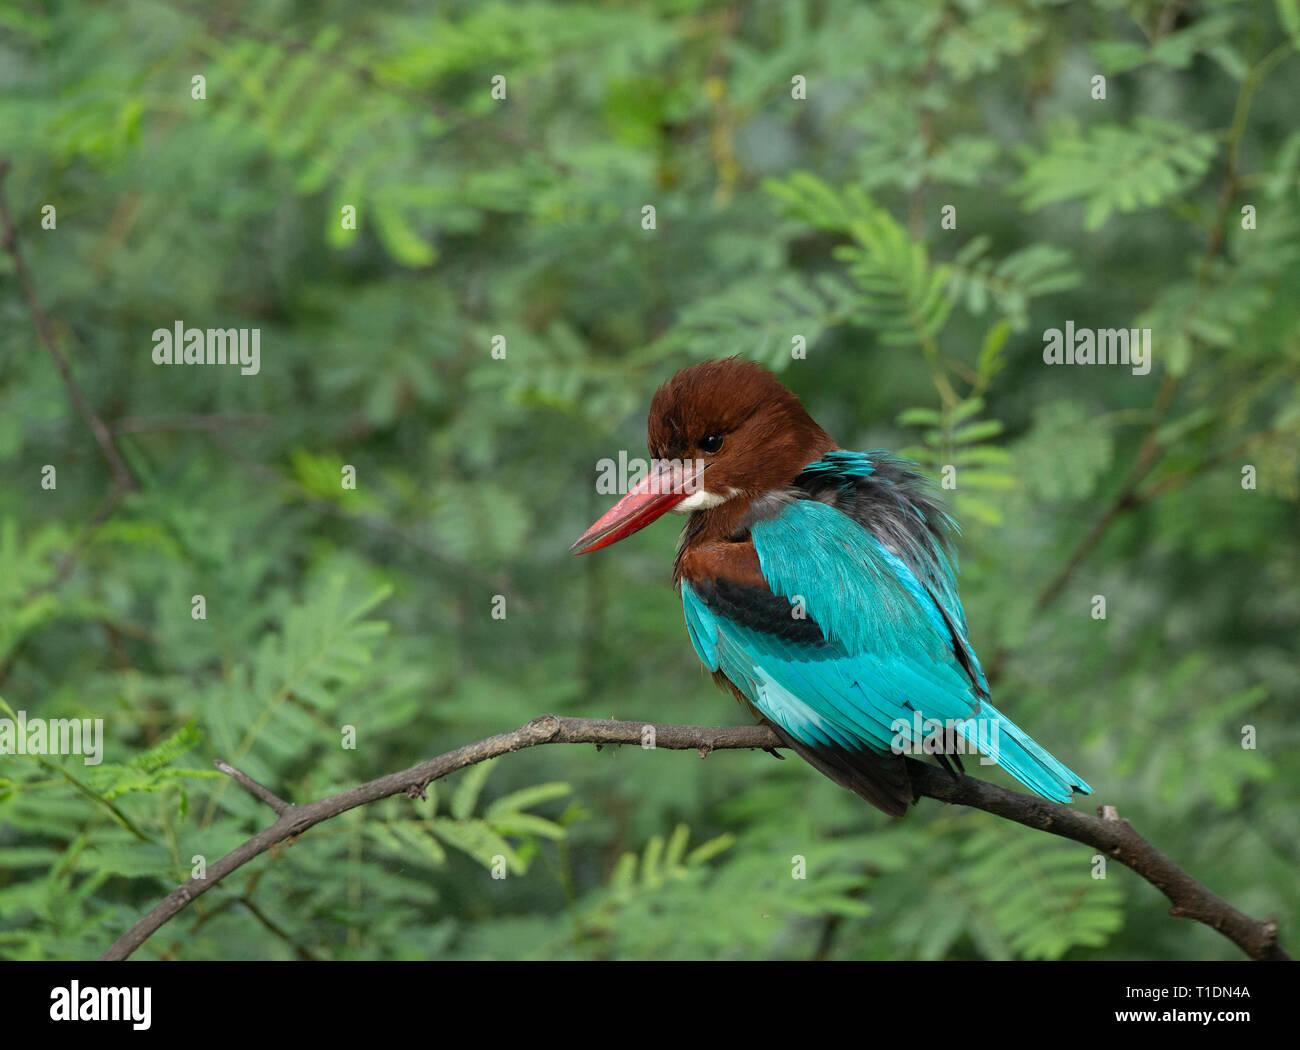 White-Breasted Kingfisher at Bharatpur Bird Sanctuary,Rajasthan,India - Stock Image